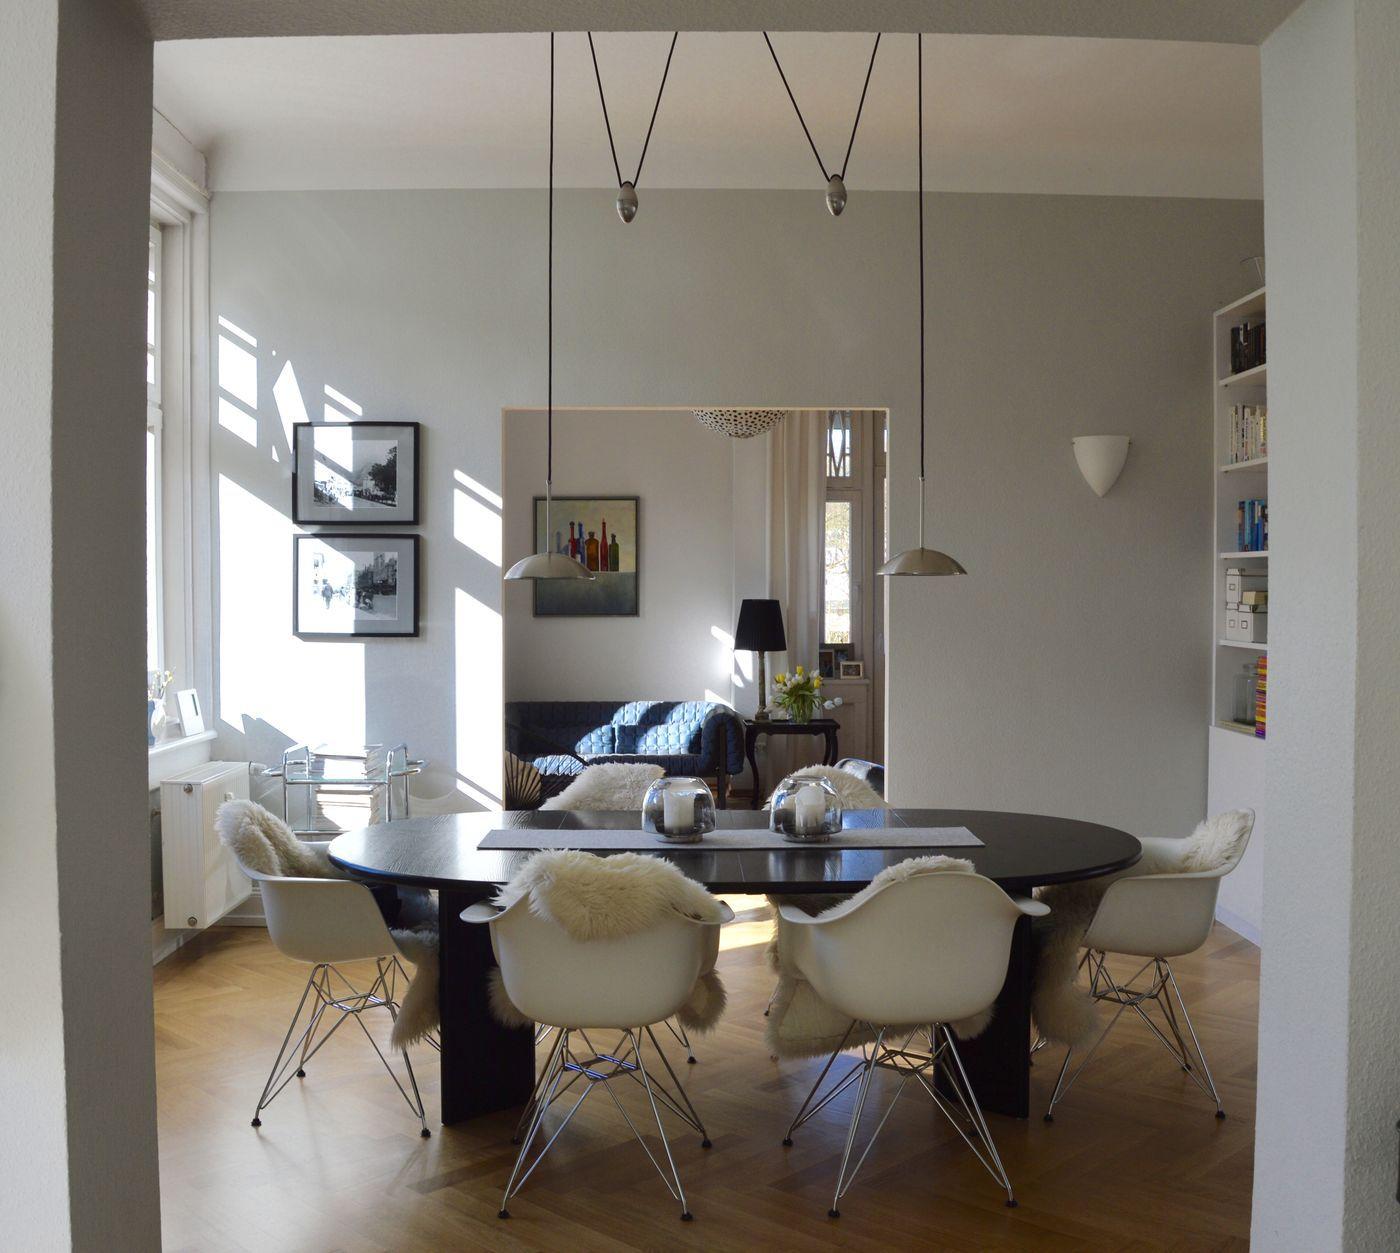 Tolle Designer Lieblingsküche Farben Ideen - Küchenschrank Ideen ...